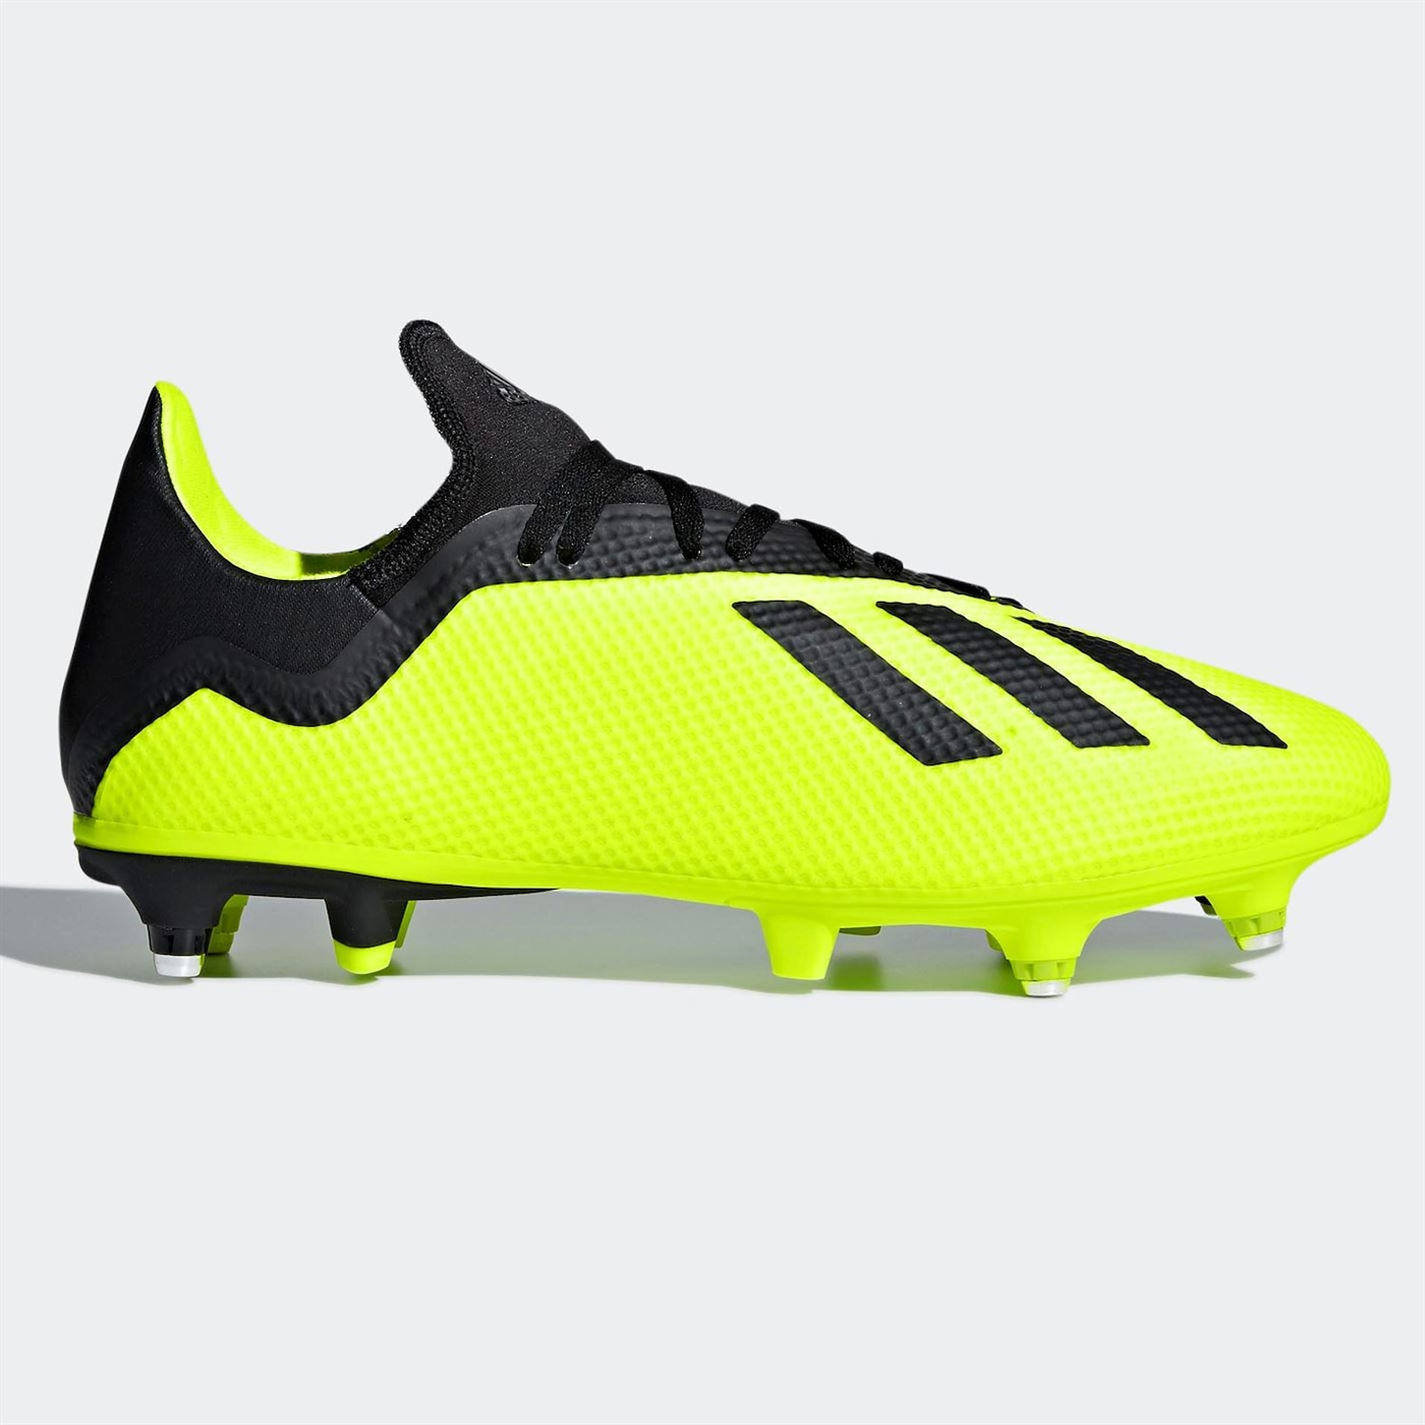 watch e6103 212c4 Adidas X 18.3 Mens SG Football Boots